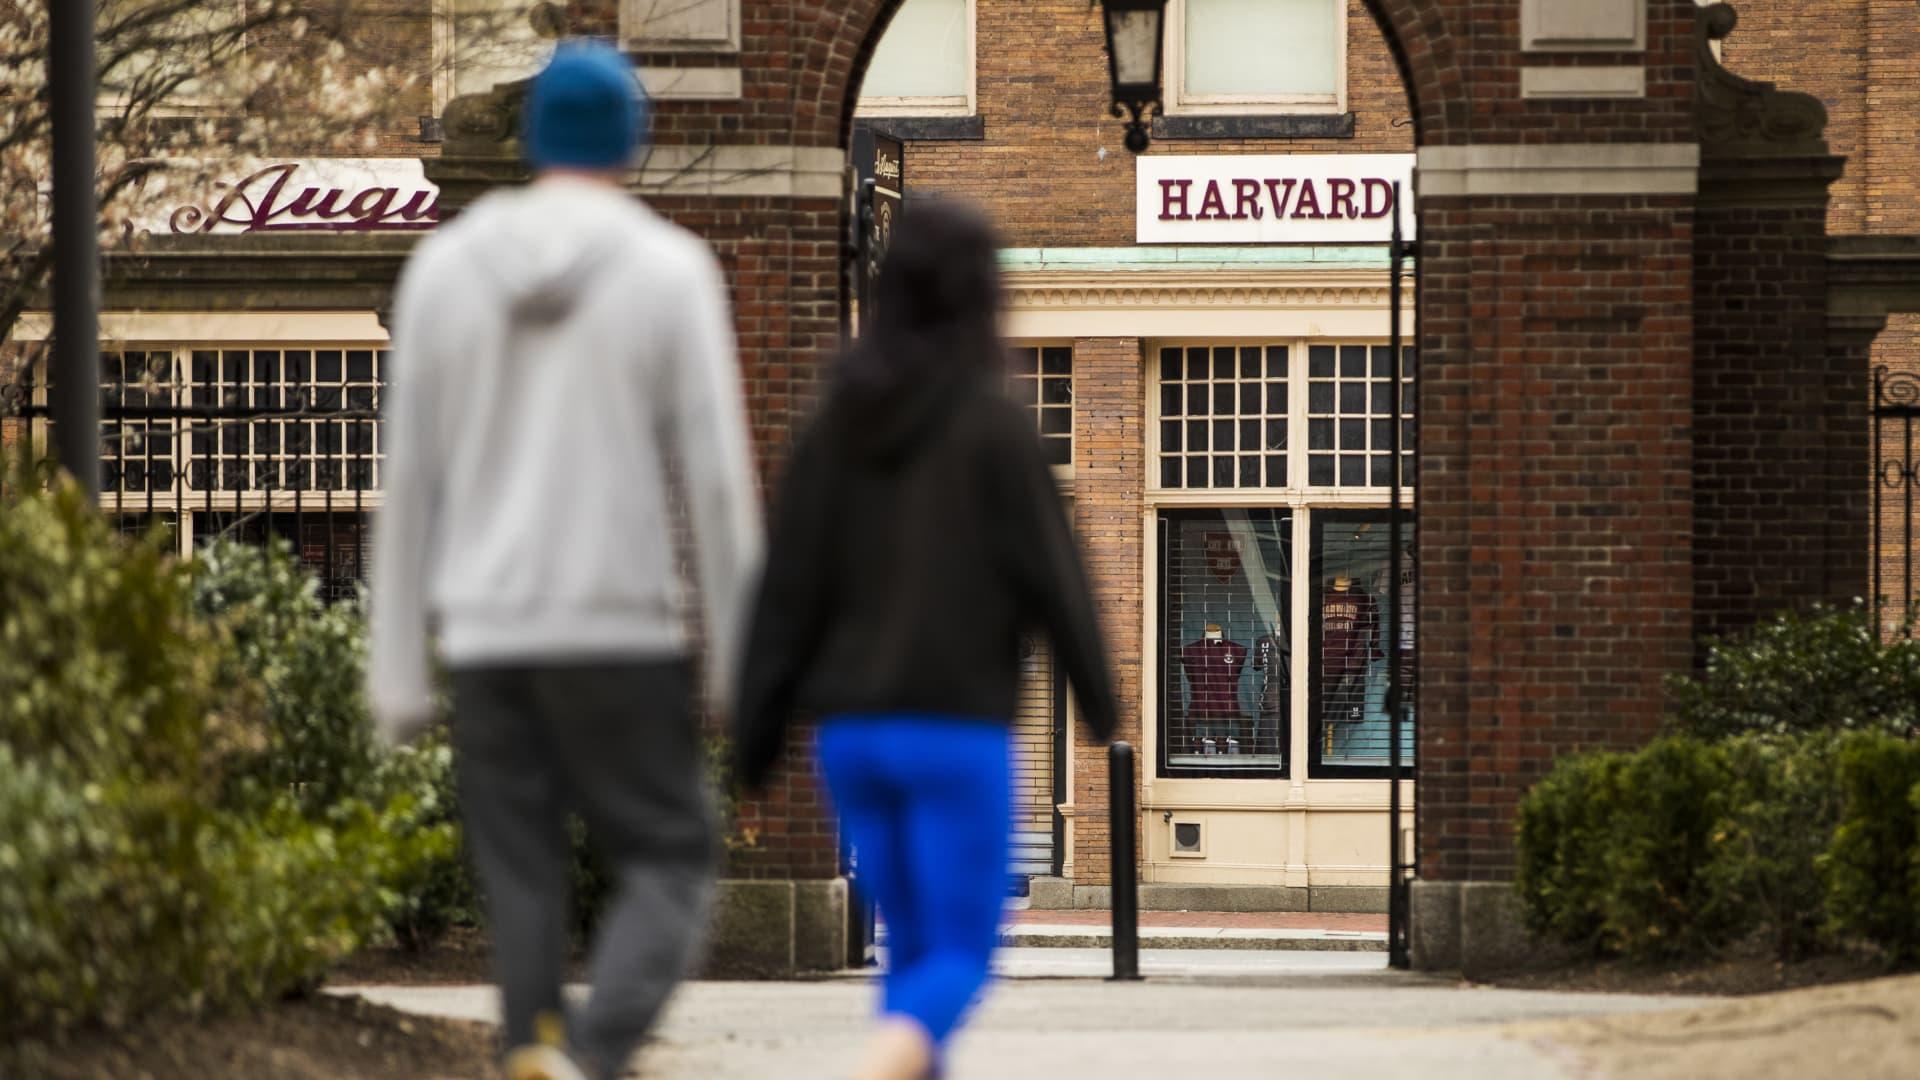 Pedestrians walk through Harvard Yard on the closed Harvard University campus in Cambridge, Massachusetts, U.S., on Monday, April 20, 2020.